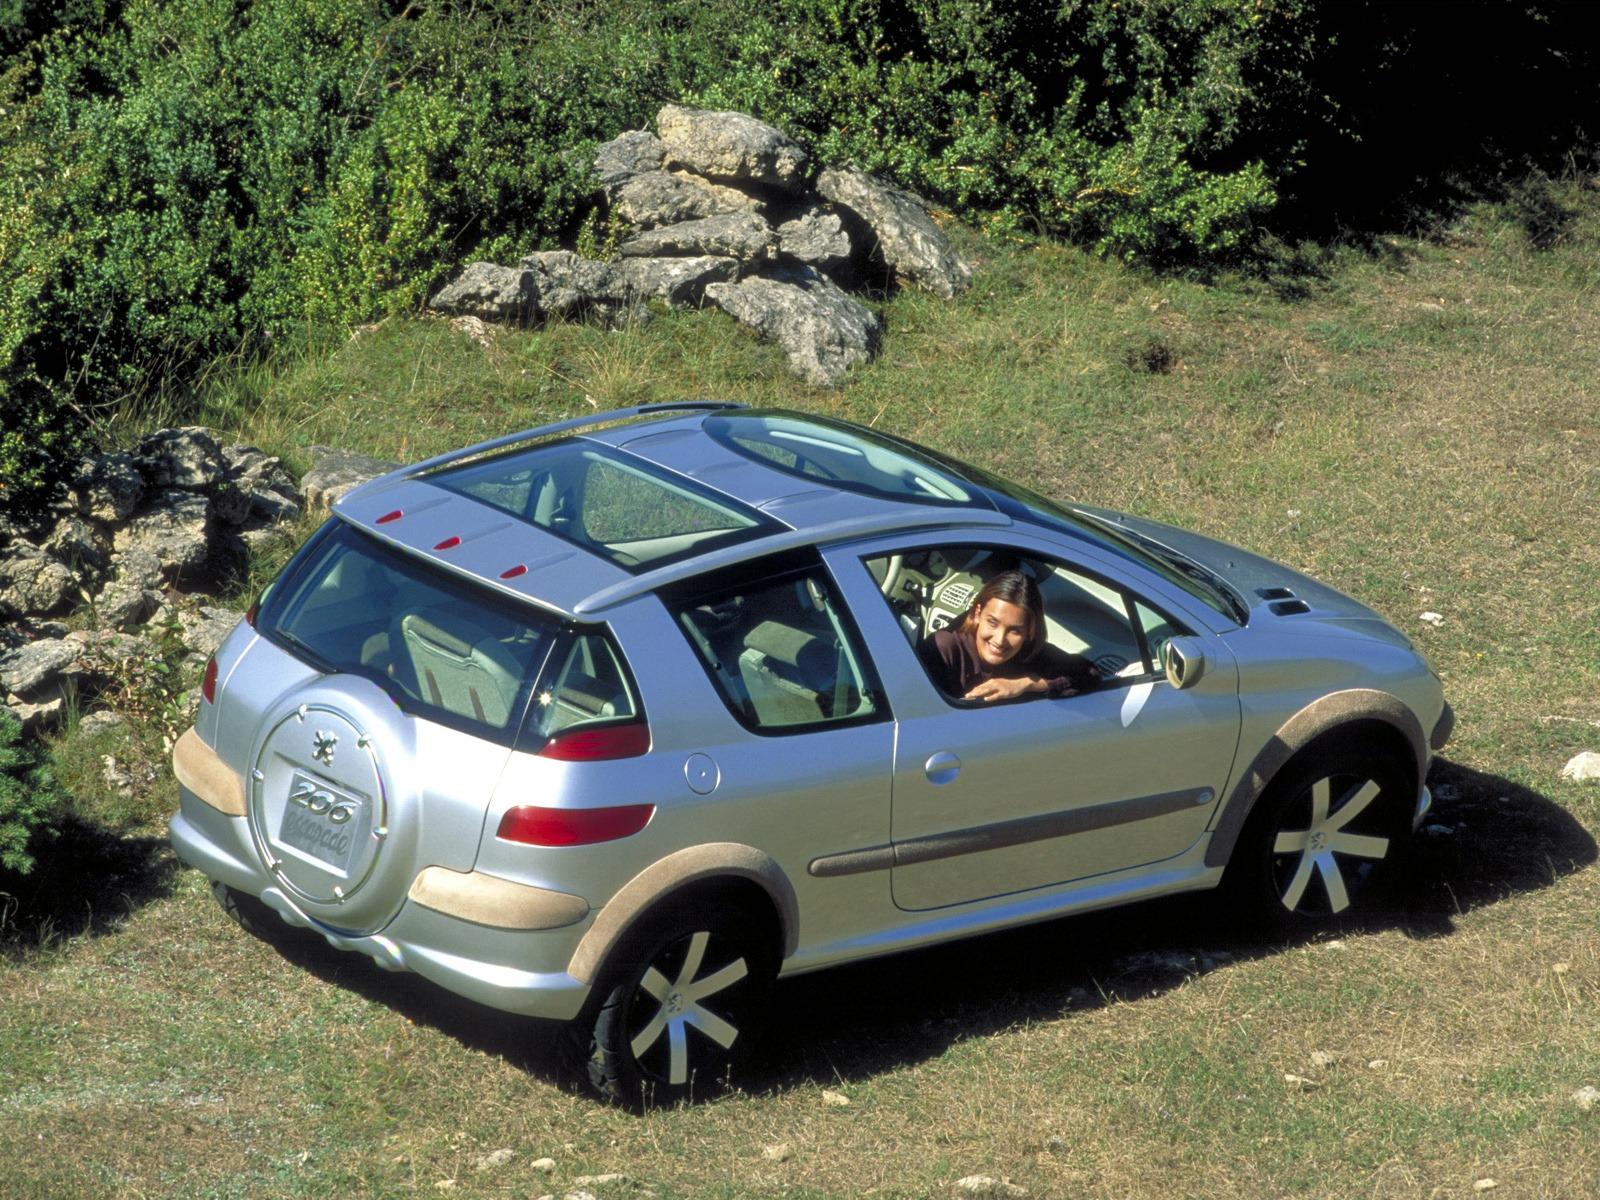 Subaru Dealer Near Me >> Peugeot 206 Escapade (1998) - Old Concept Cars